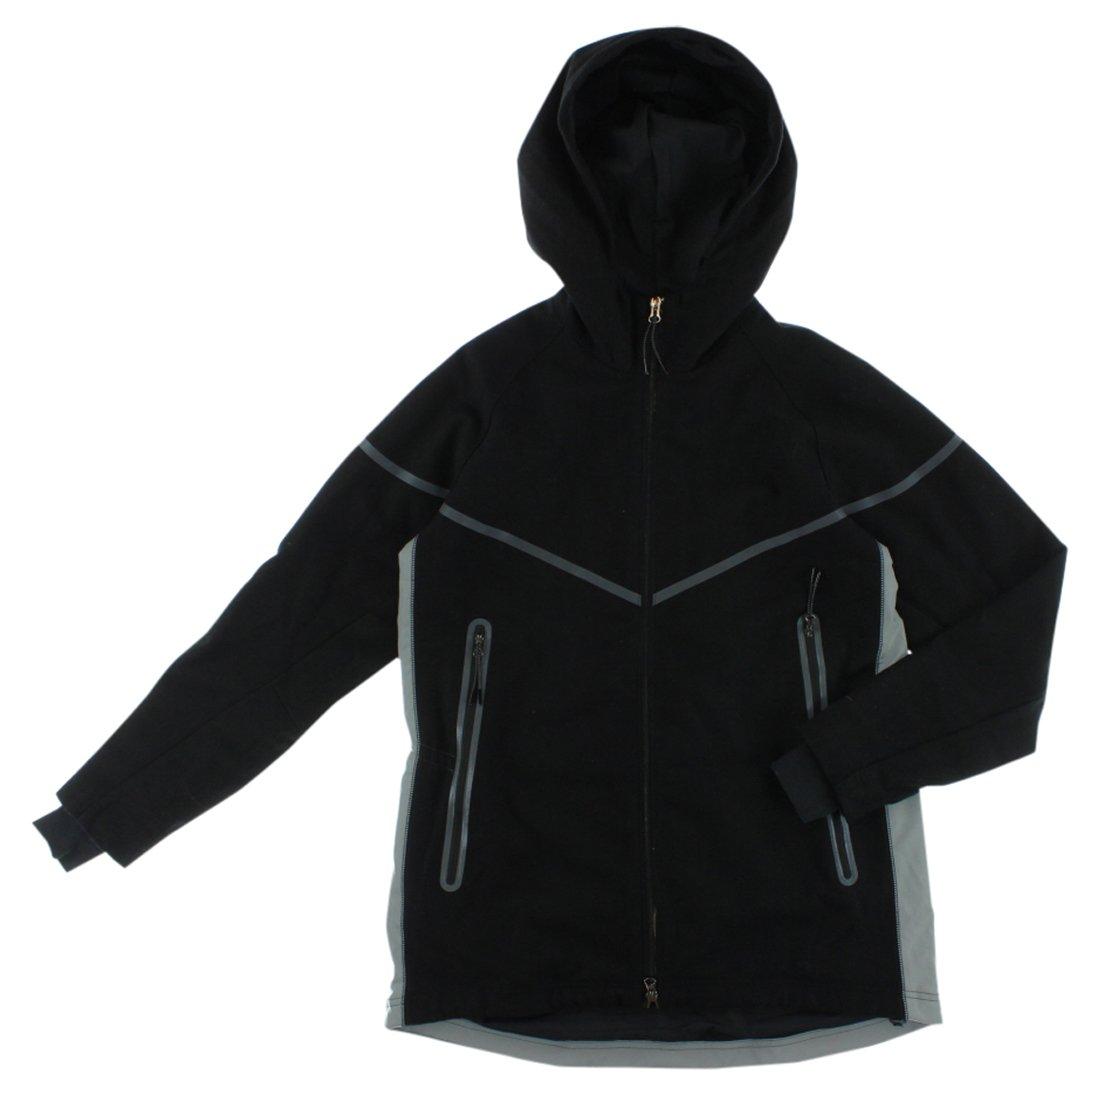 Amazon.com: Nike lana chamarra reflectante para mujer ...